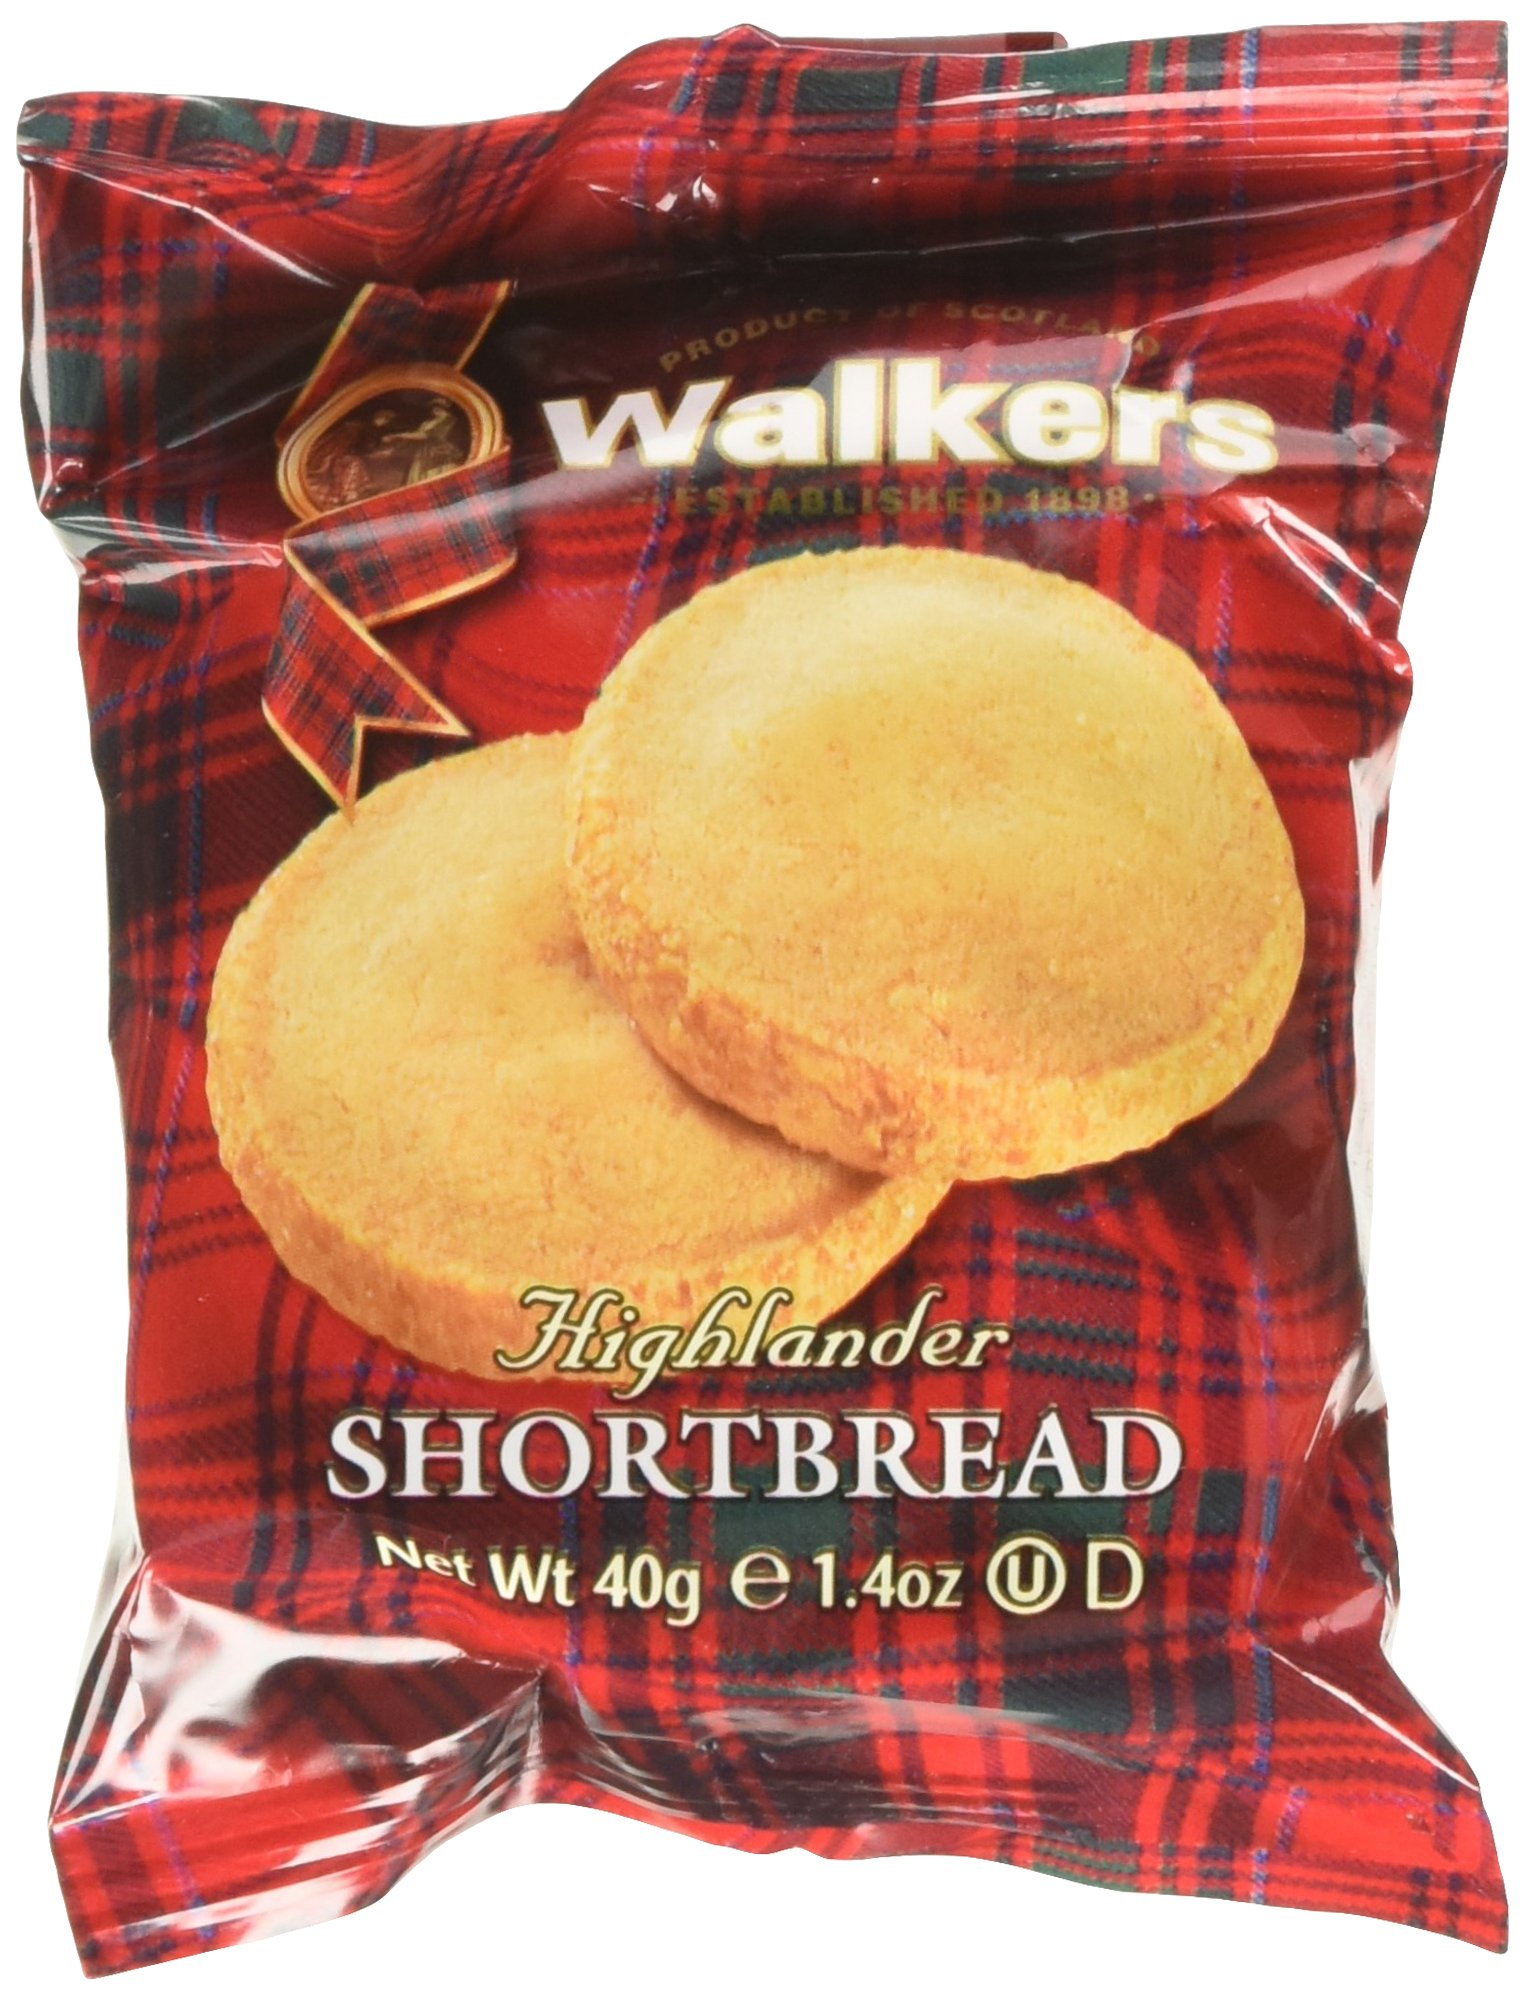 Amazon Walkers Shortbread Chocolate Chip 2 Count Cookies